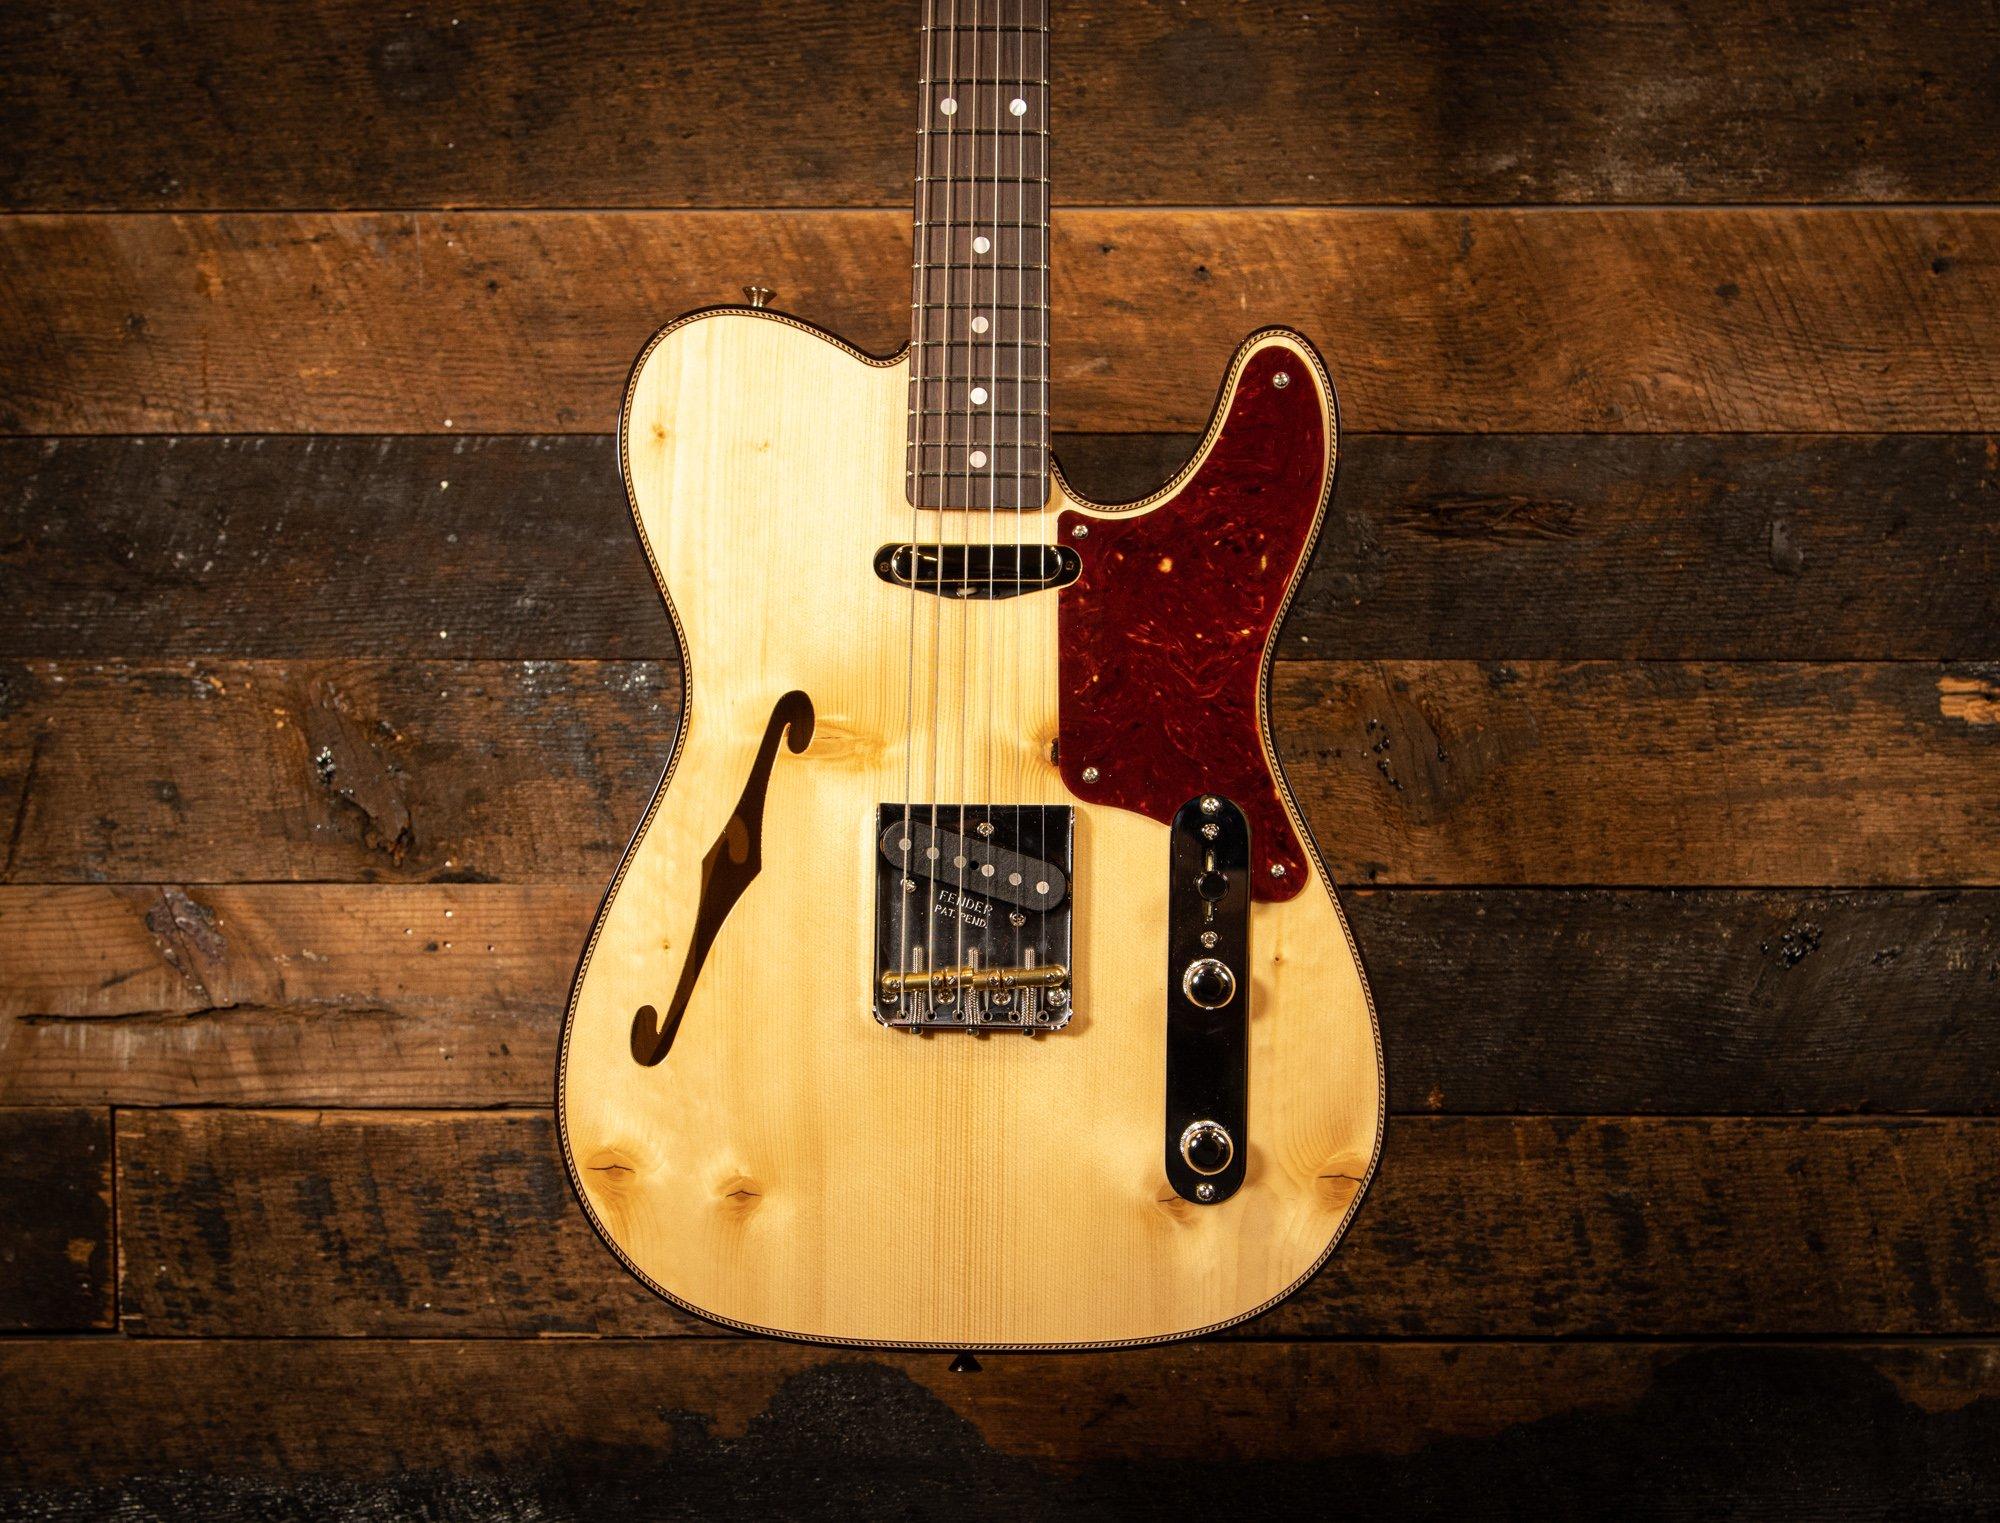 Fender Custom Shop Knotty Pine Telecaster NOS in Natural Finish